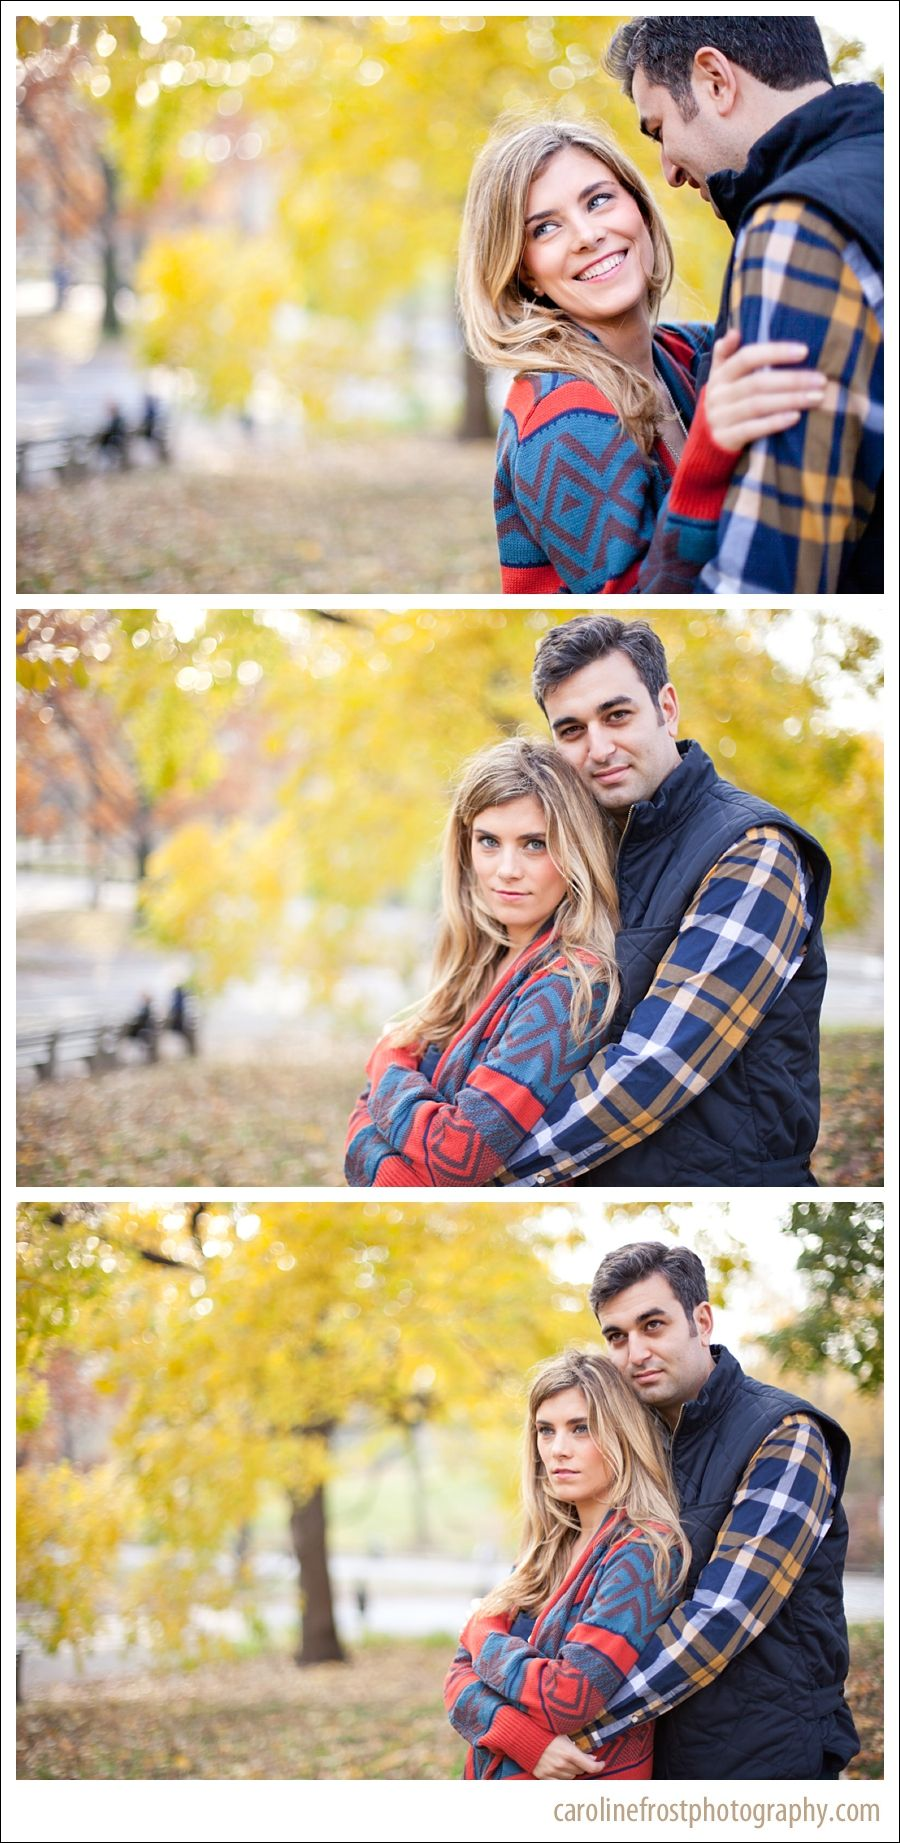 holly_sam_engagement_photos-7